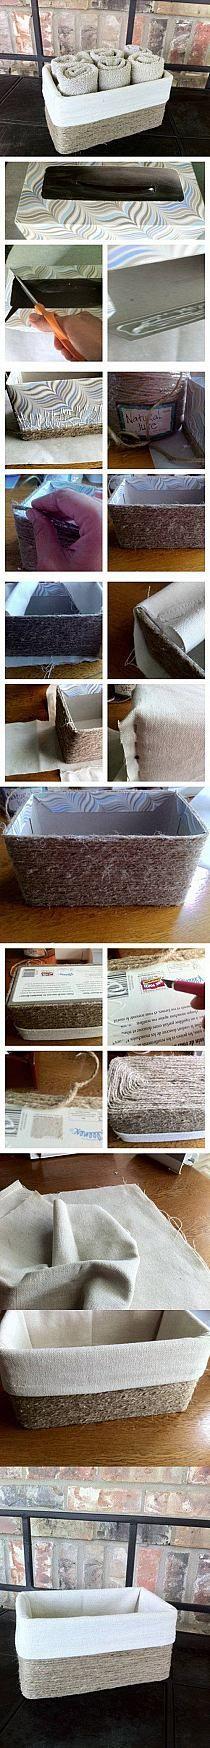 DIY Jute Basket from Cardboard Box DIY Projects | Usefu…